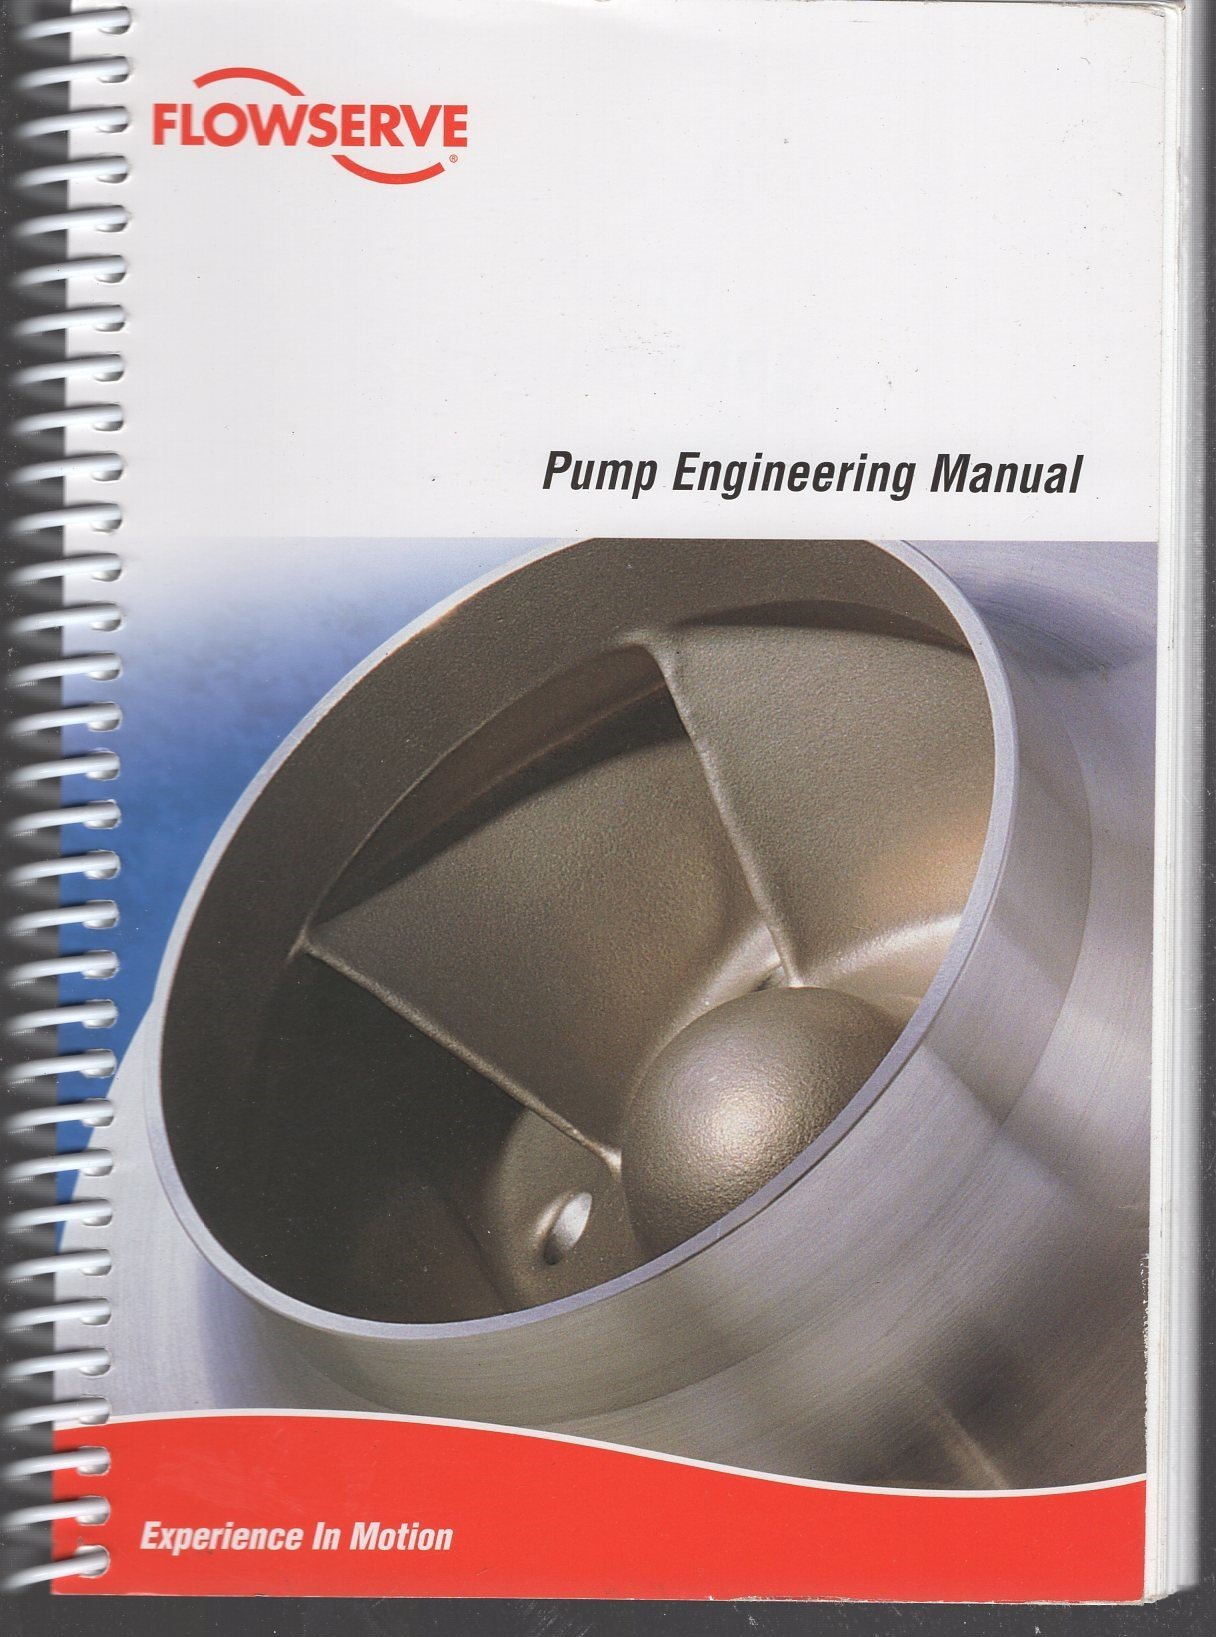 pump engineering manual flowserve amazon com books rh amazon com flowserve guardian pump manual flowserve pump manual ervl